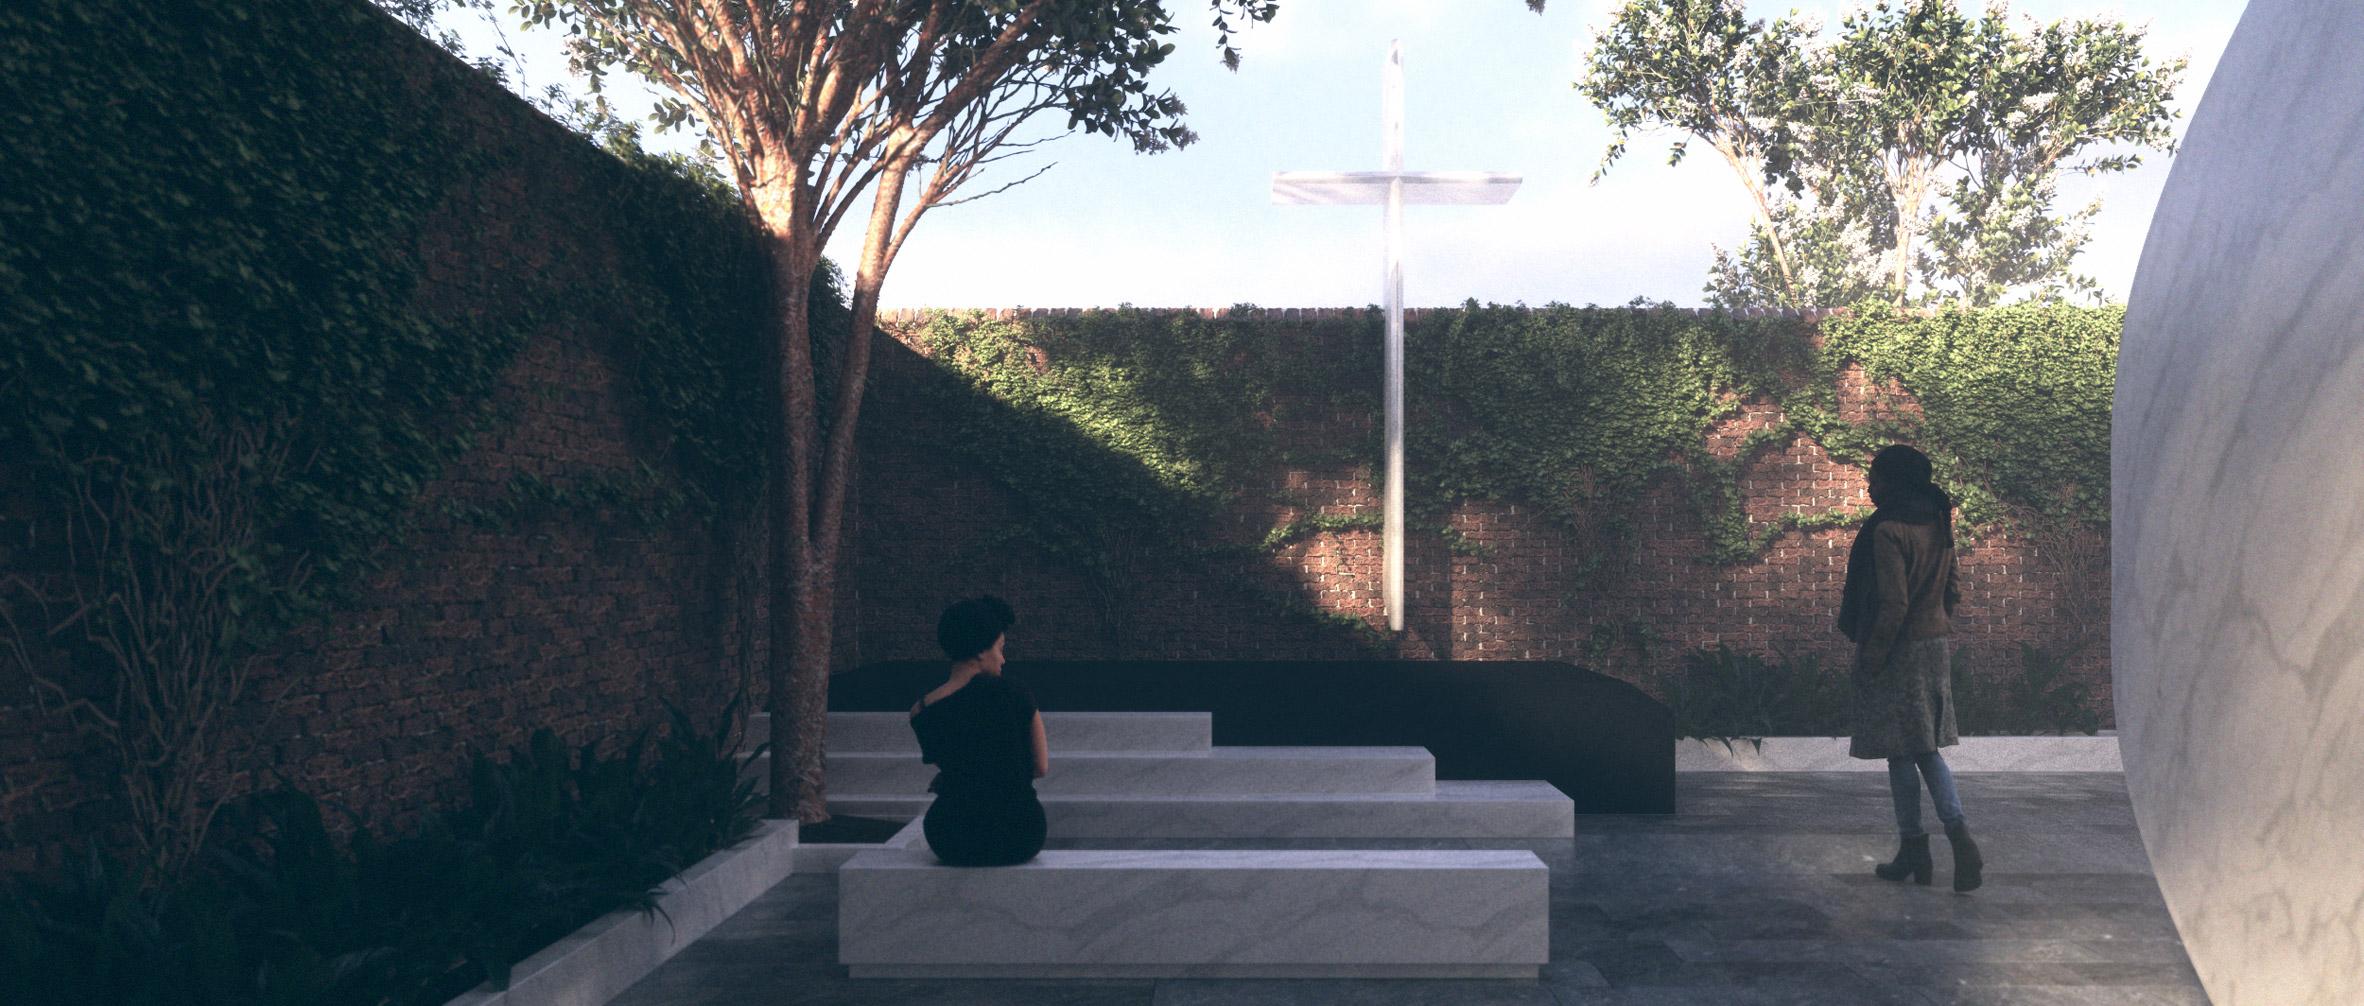 The Emanuel Nine Memorial by Michael Arad